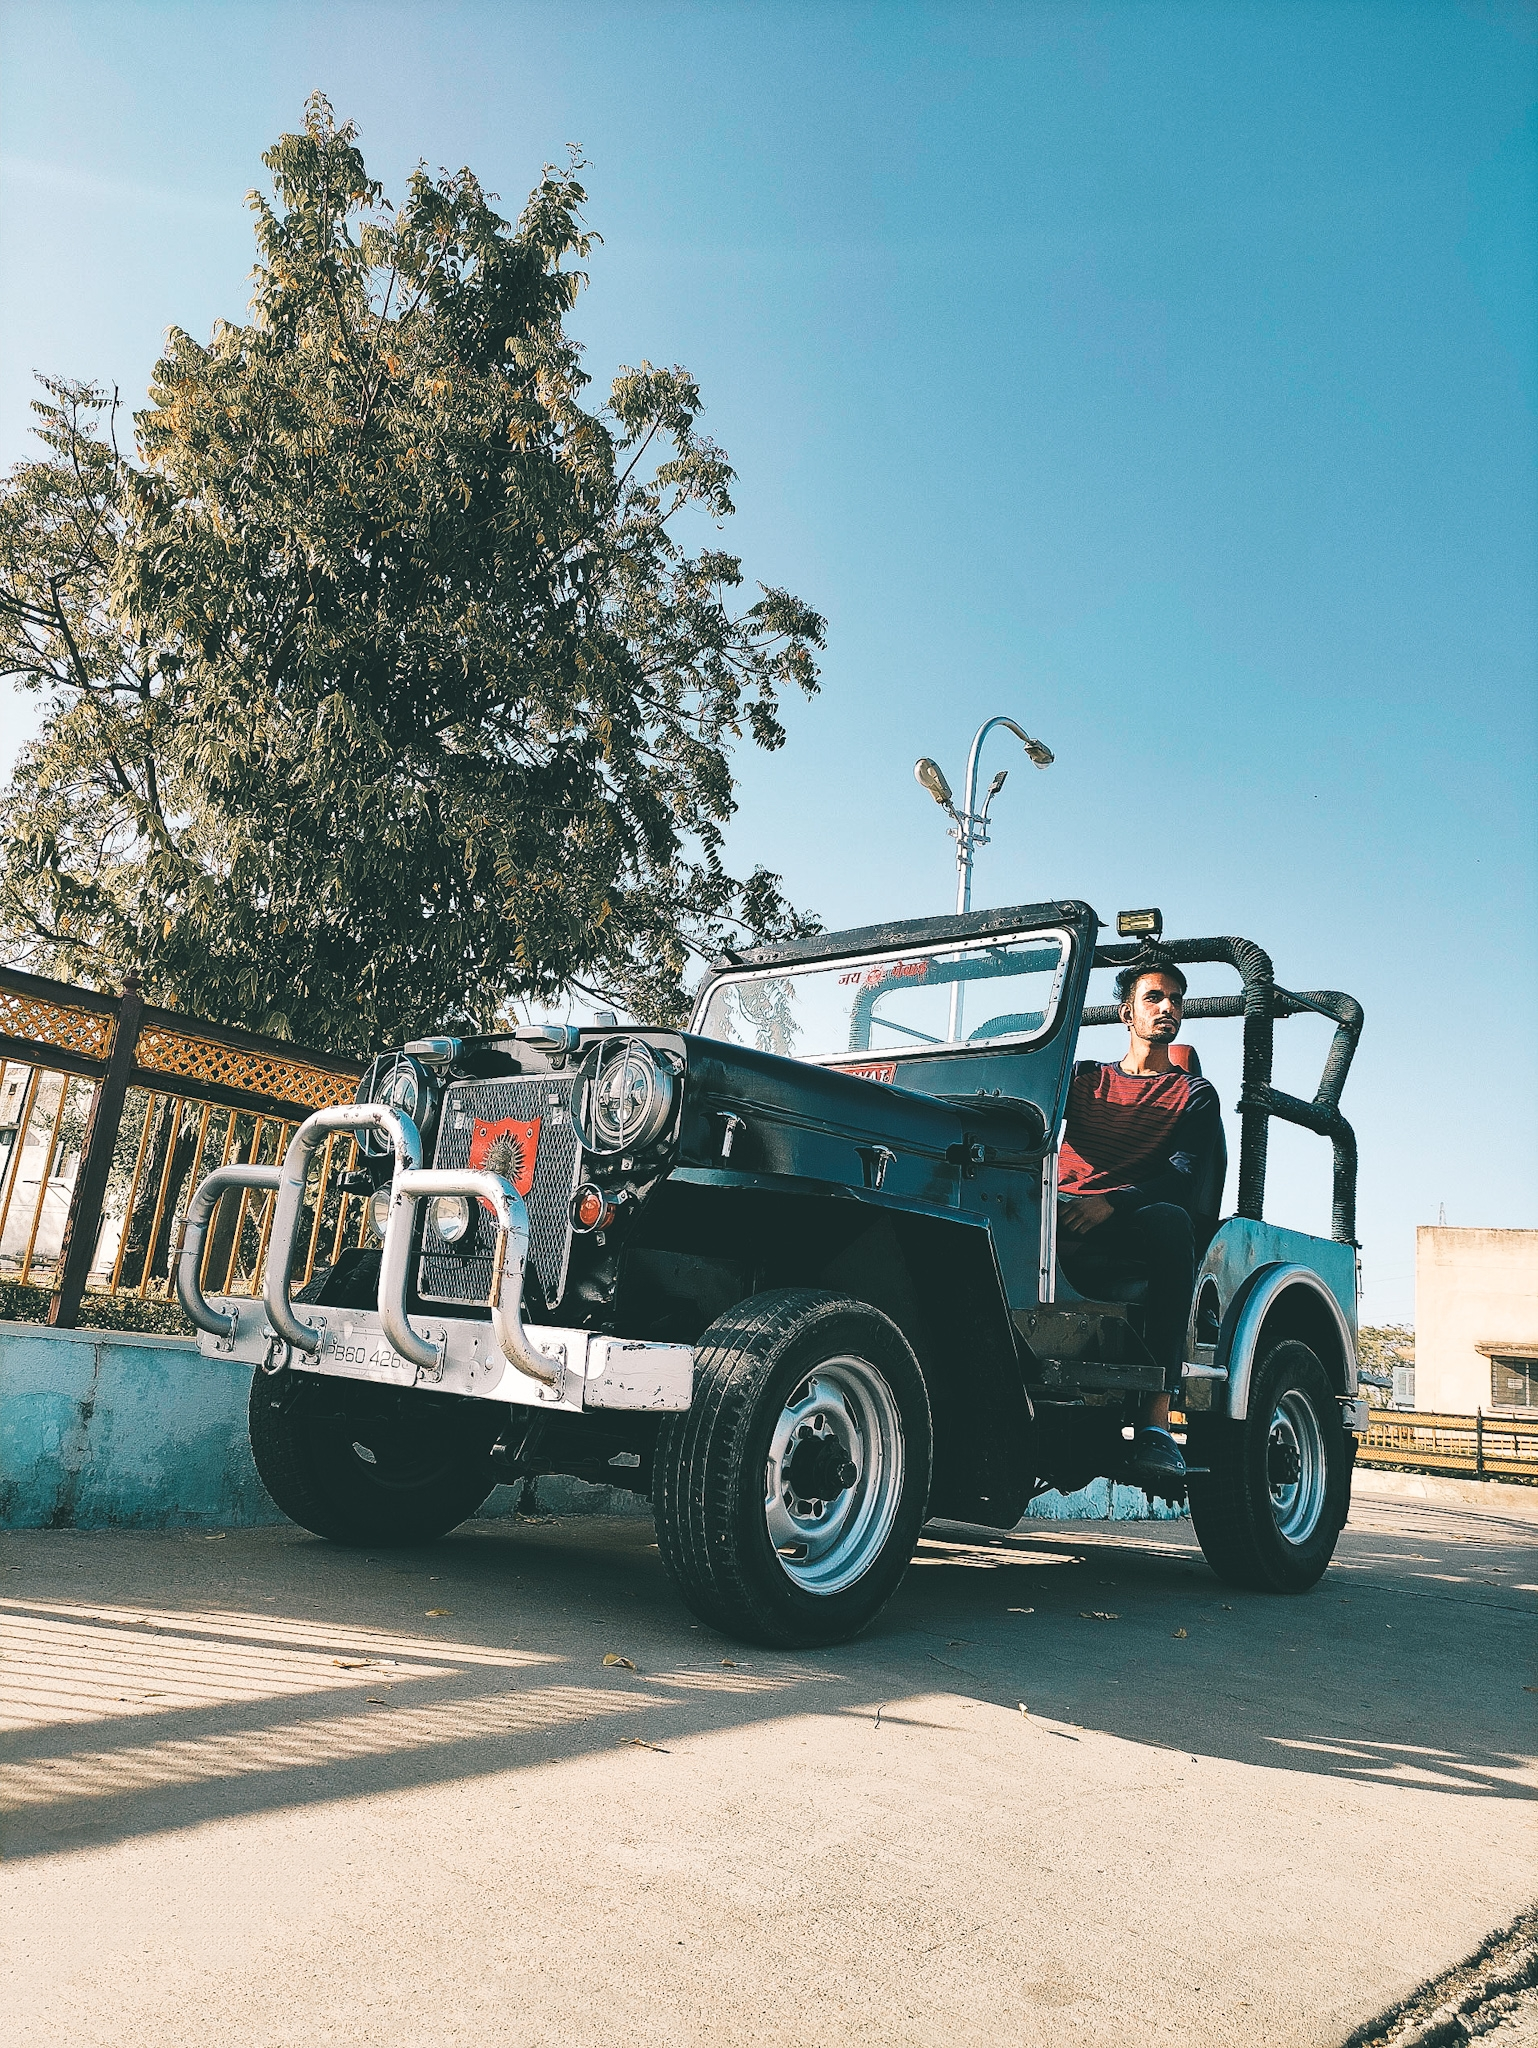 A jeep vehicle